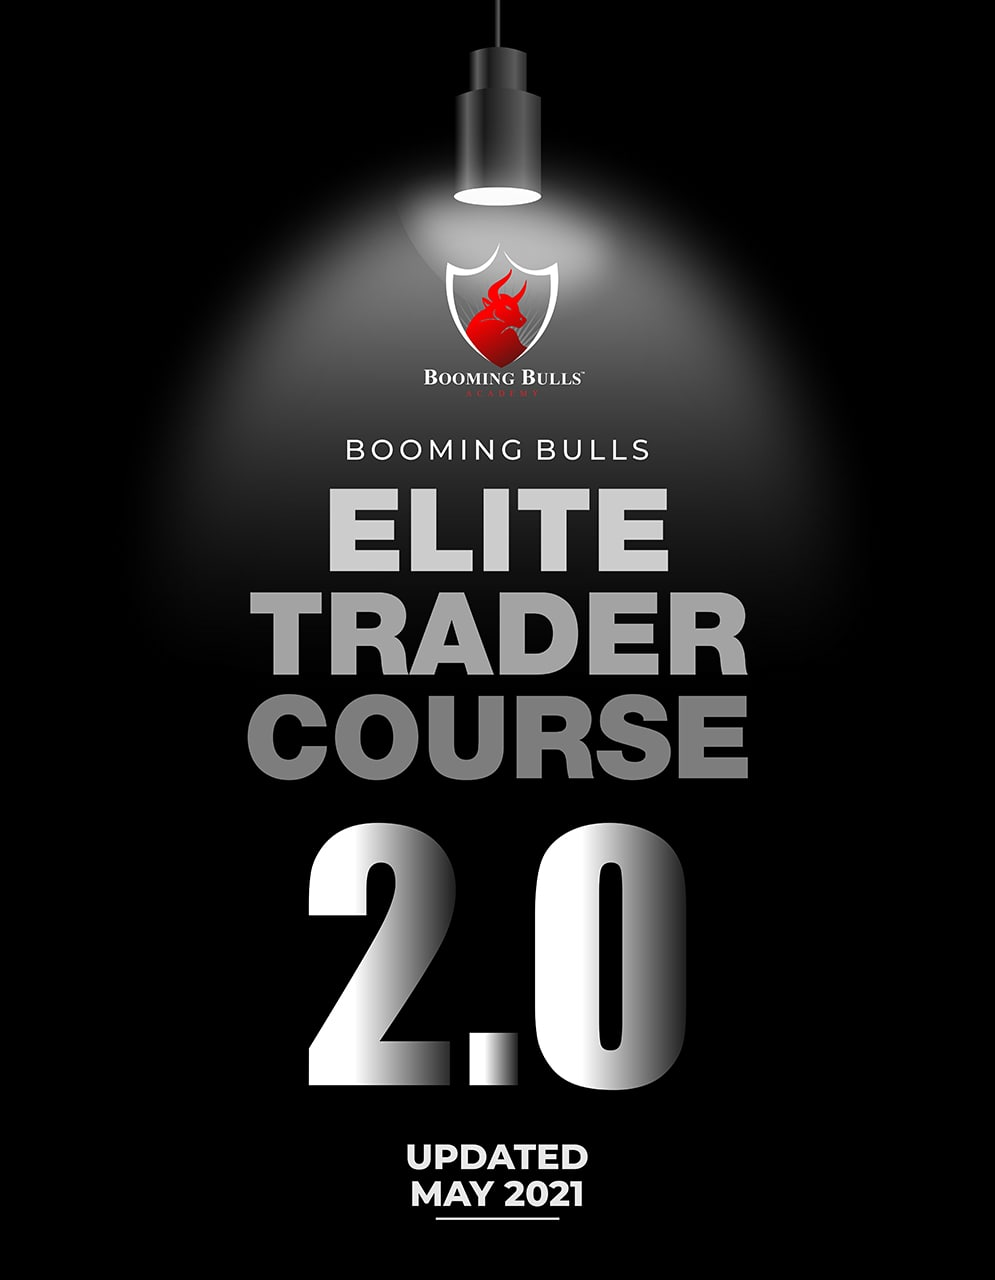 Elite Trader Program 2.0